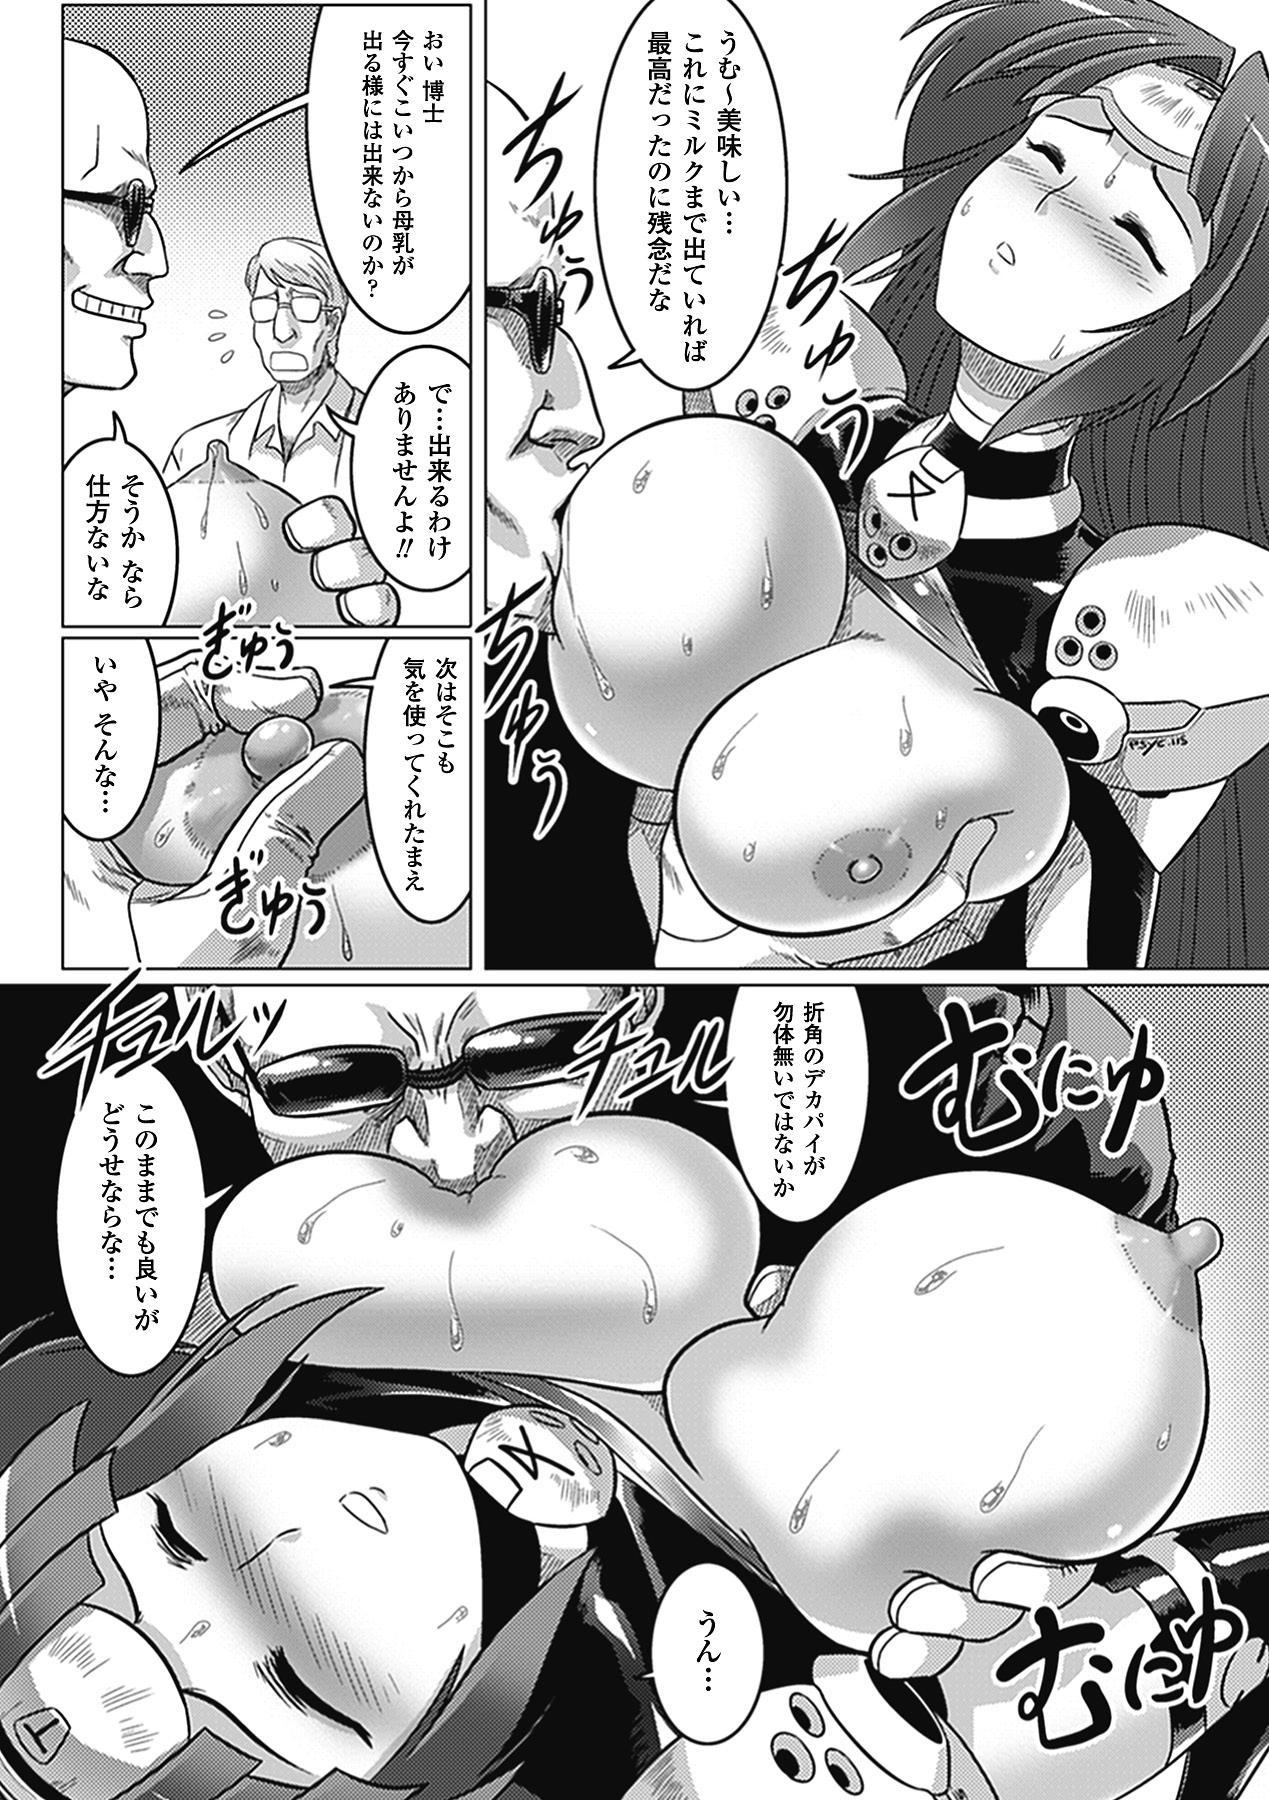 Megami Crisis 5 113